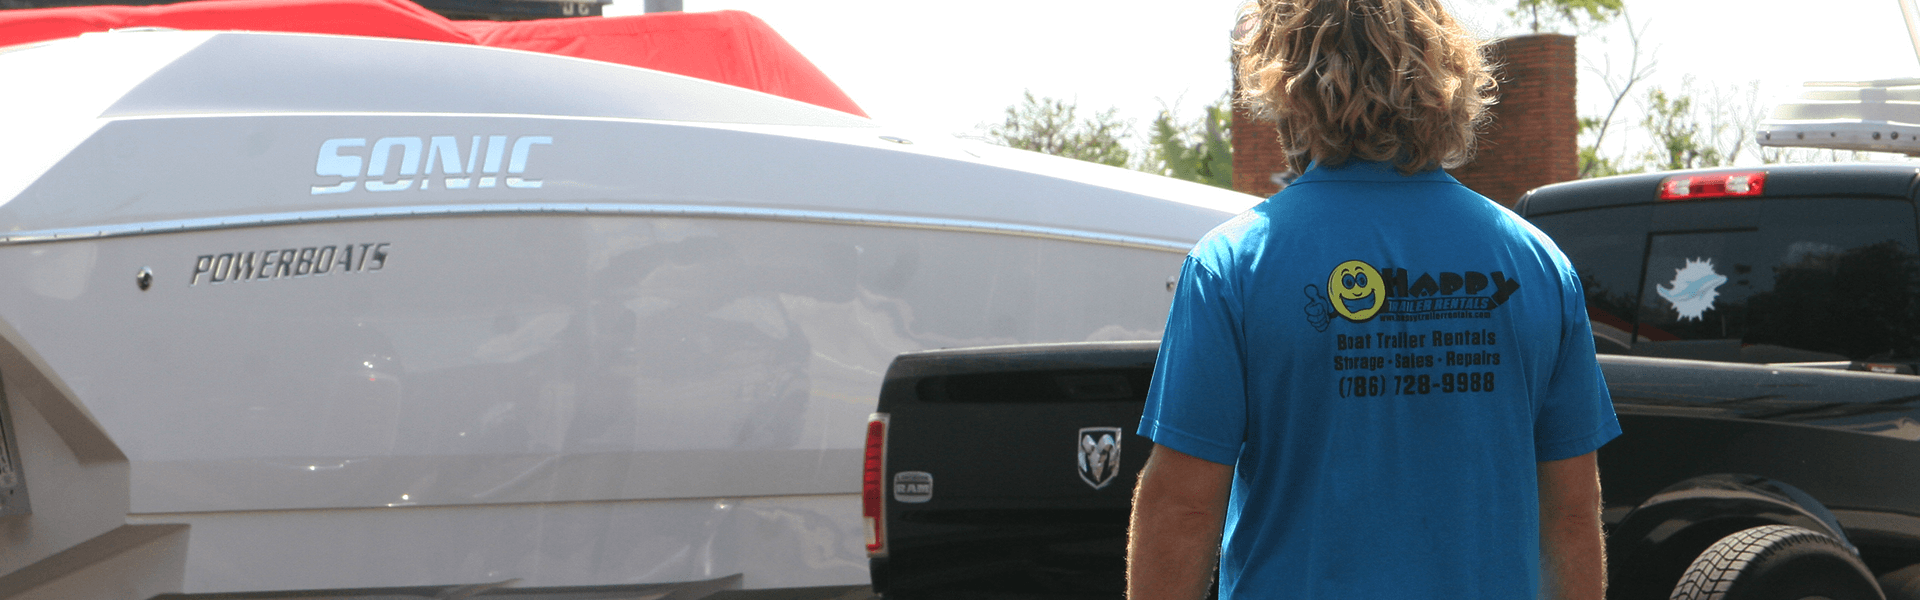 dry-storage-for-boat-in-miami